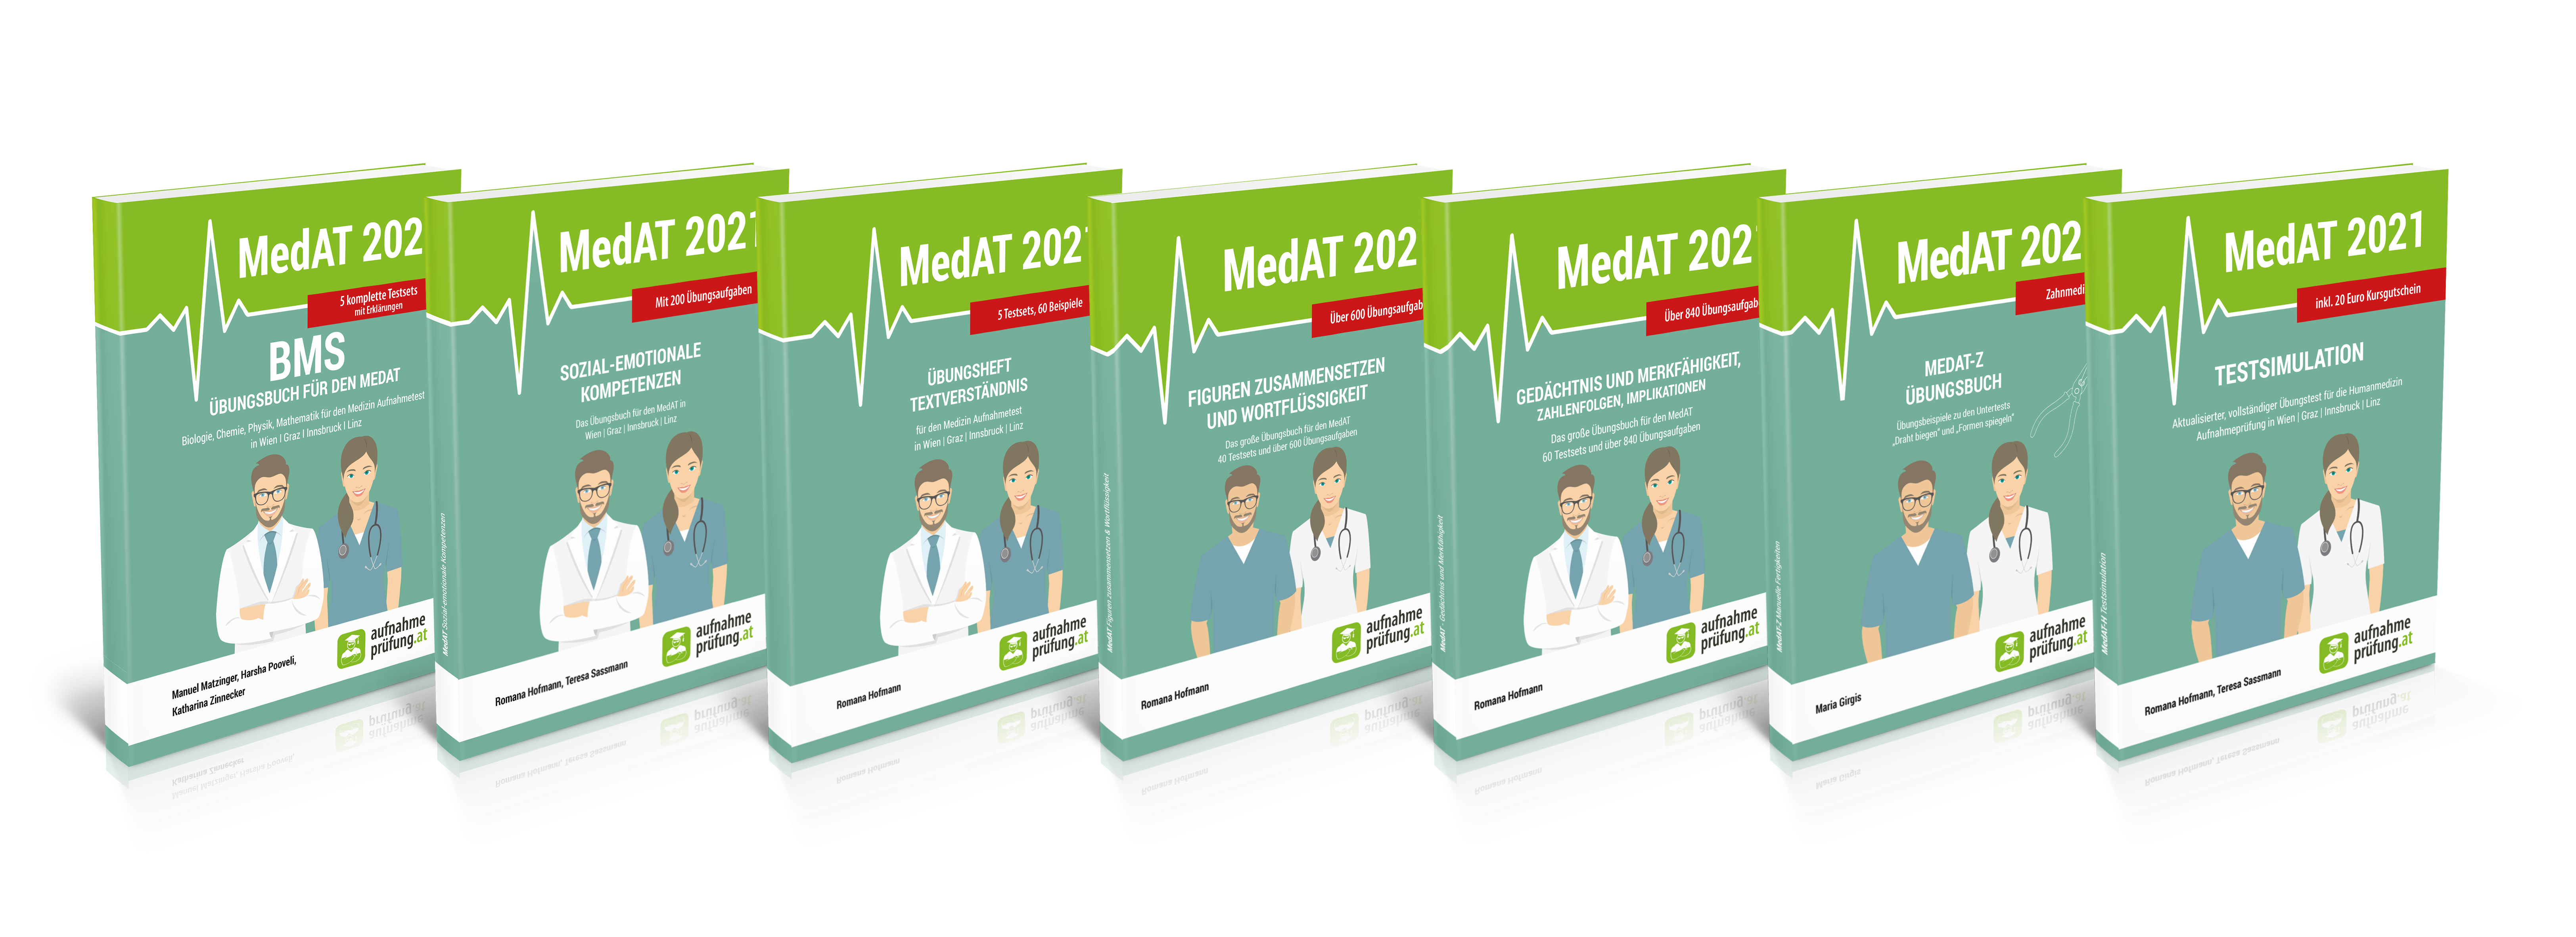 MedAT-Bücher-Serie